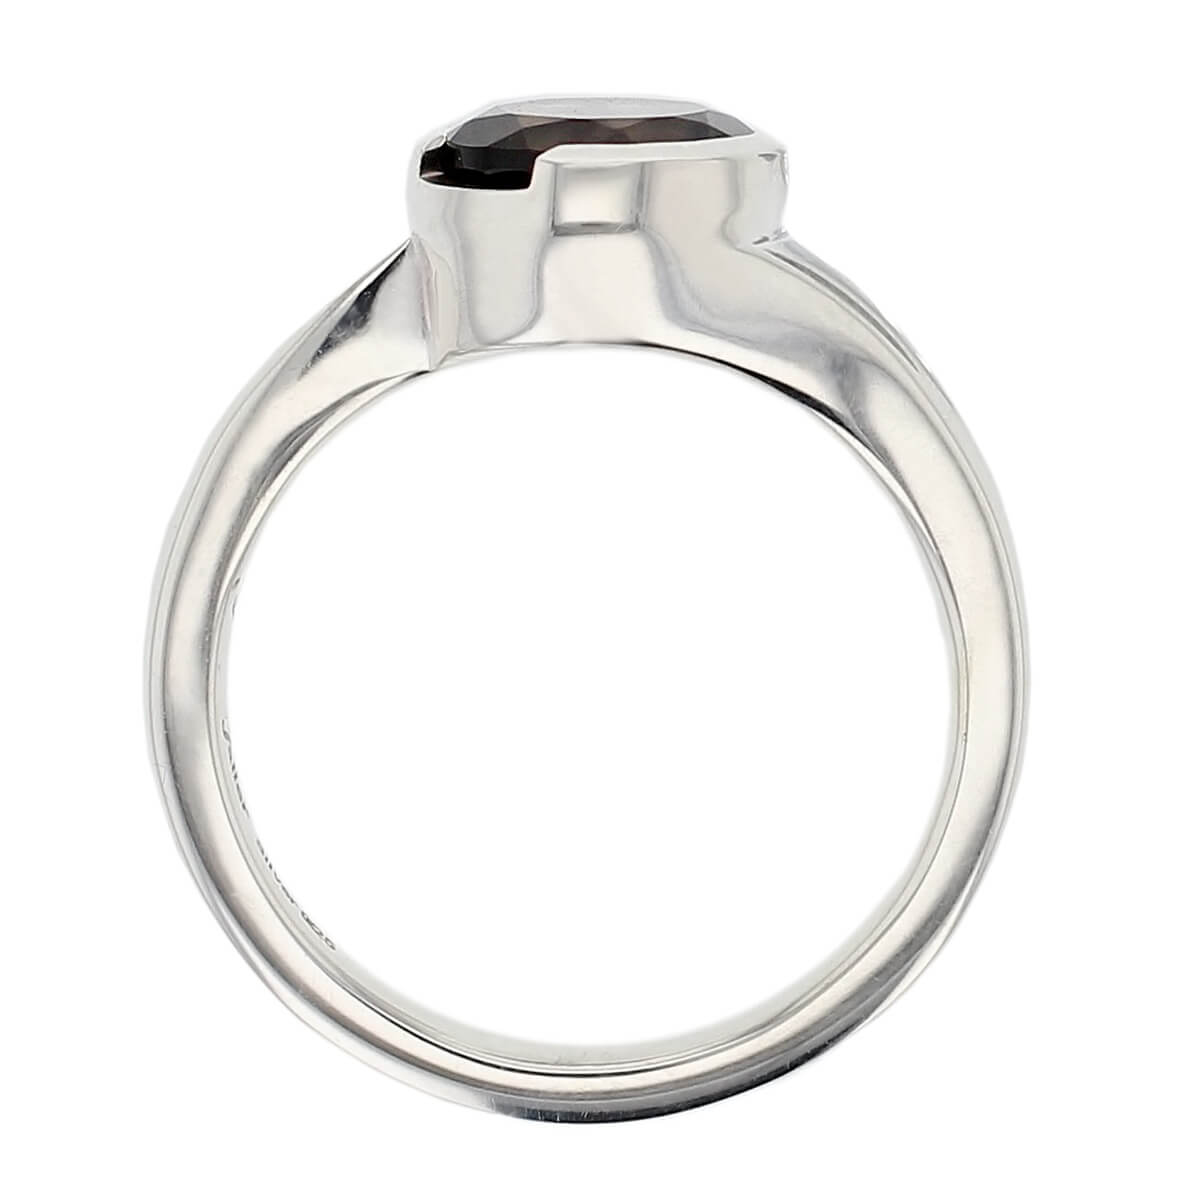 sterling silver round cut faceted smoky quartz gemstone dress ring, designer jewellery, smokey quartz gem, jewelry, handmade by Faller, Londonderry, Northern Ireland, Irish hand crafted, darcy, D'arcy